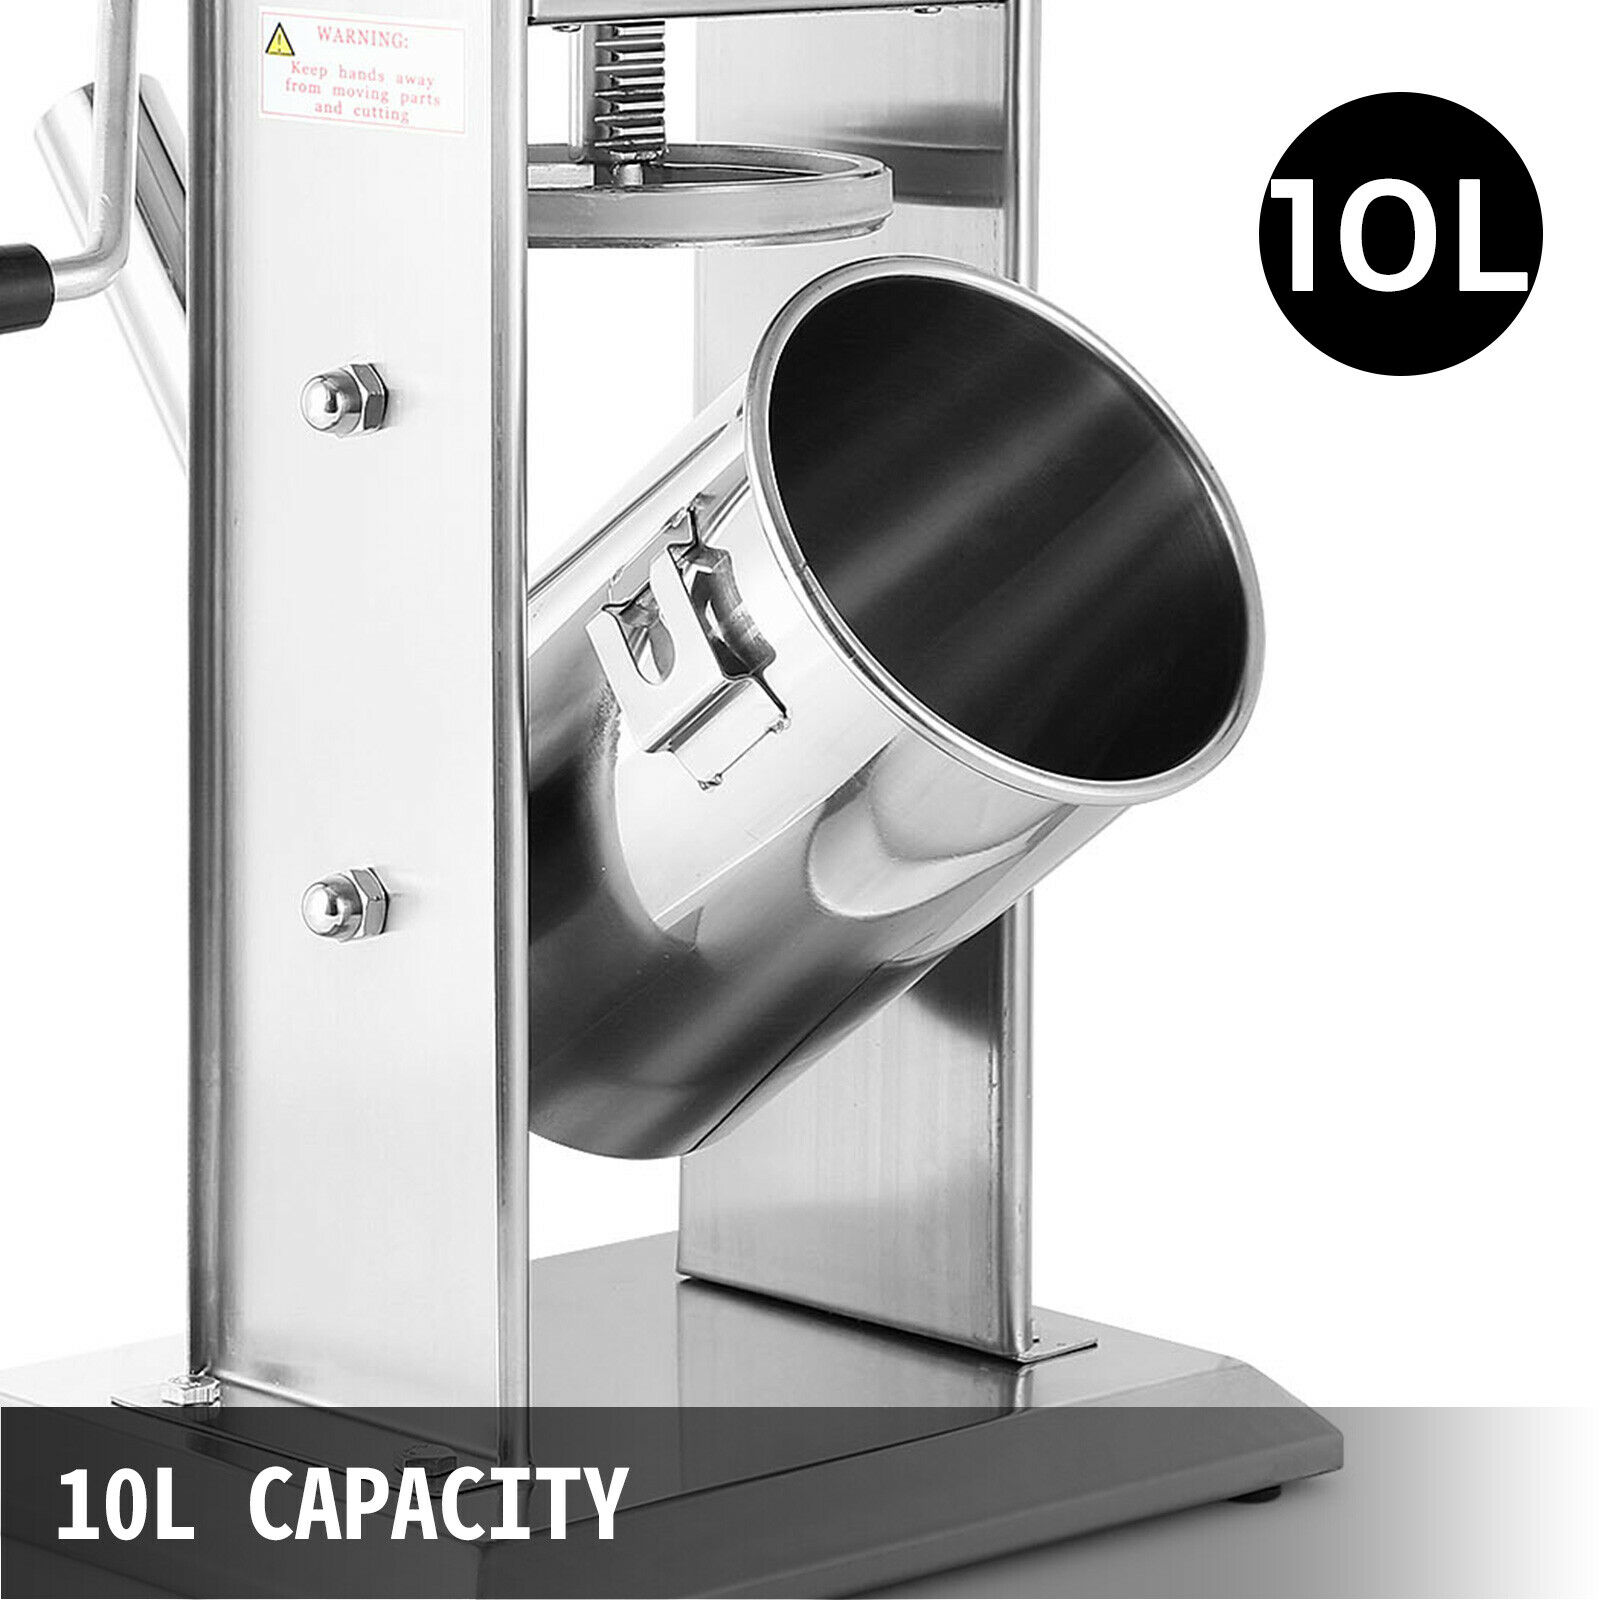 10L السجق ستوفير صانع اللحوم آلة الفولاذ المقاوم للصدأ 5 فوهات حشو يدوي